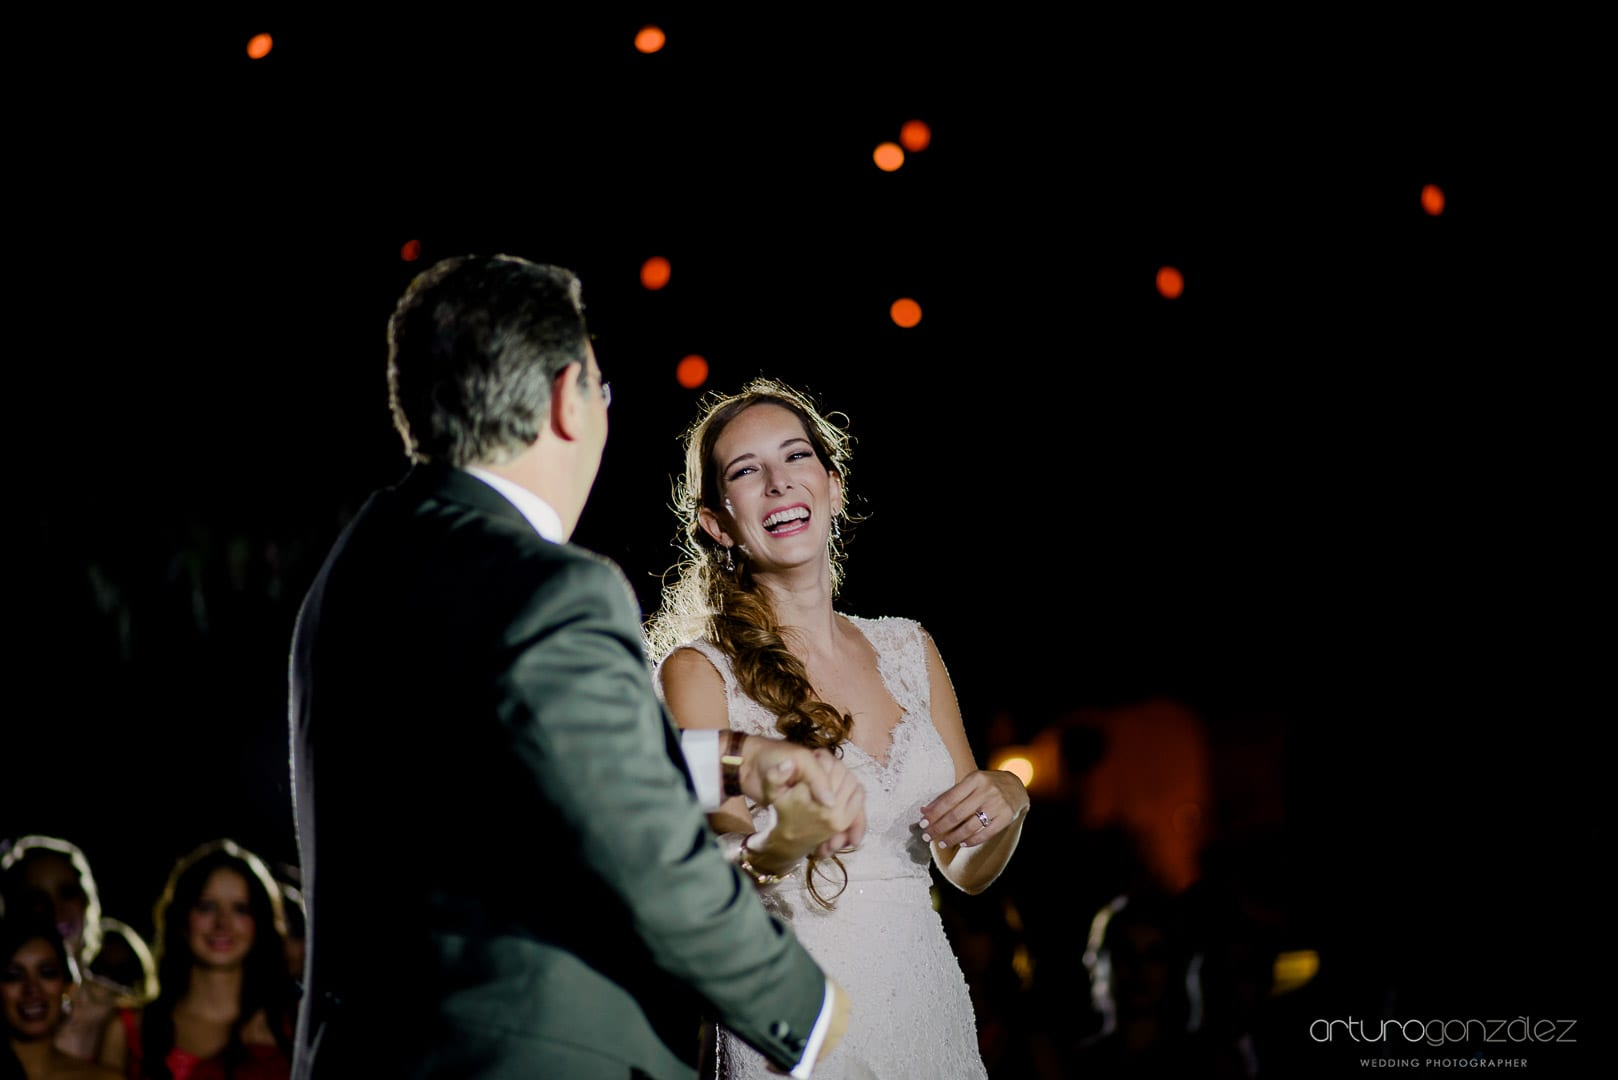 fotografo-de-bodas-en-guanajuato-116